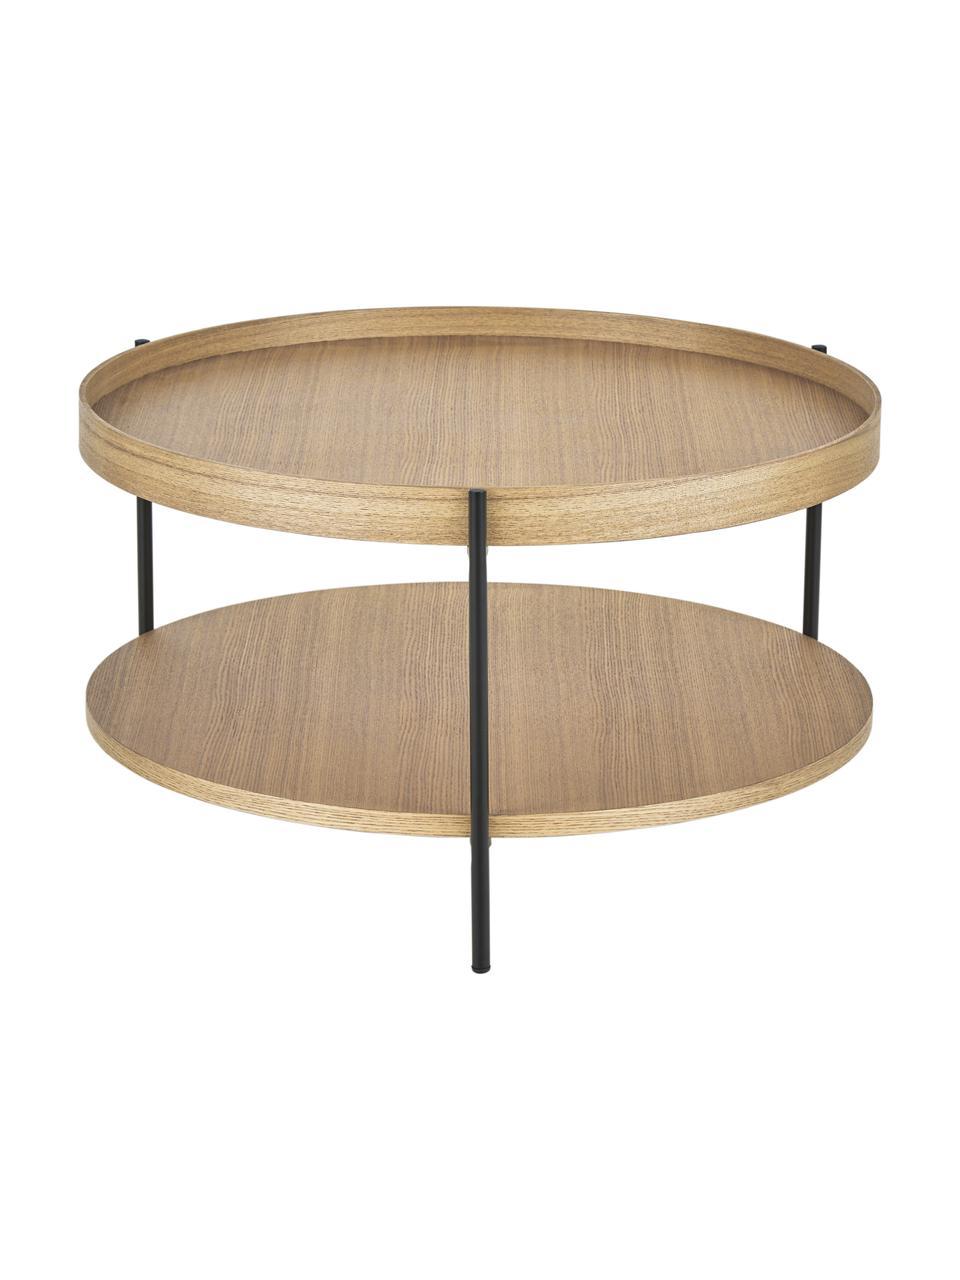 Holz-Couchtisch Renee mit Eschenholzfurnier, Gestell: Metall, pulverbeschichtet, Eschenholz, Ø 69 x H 39 cm